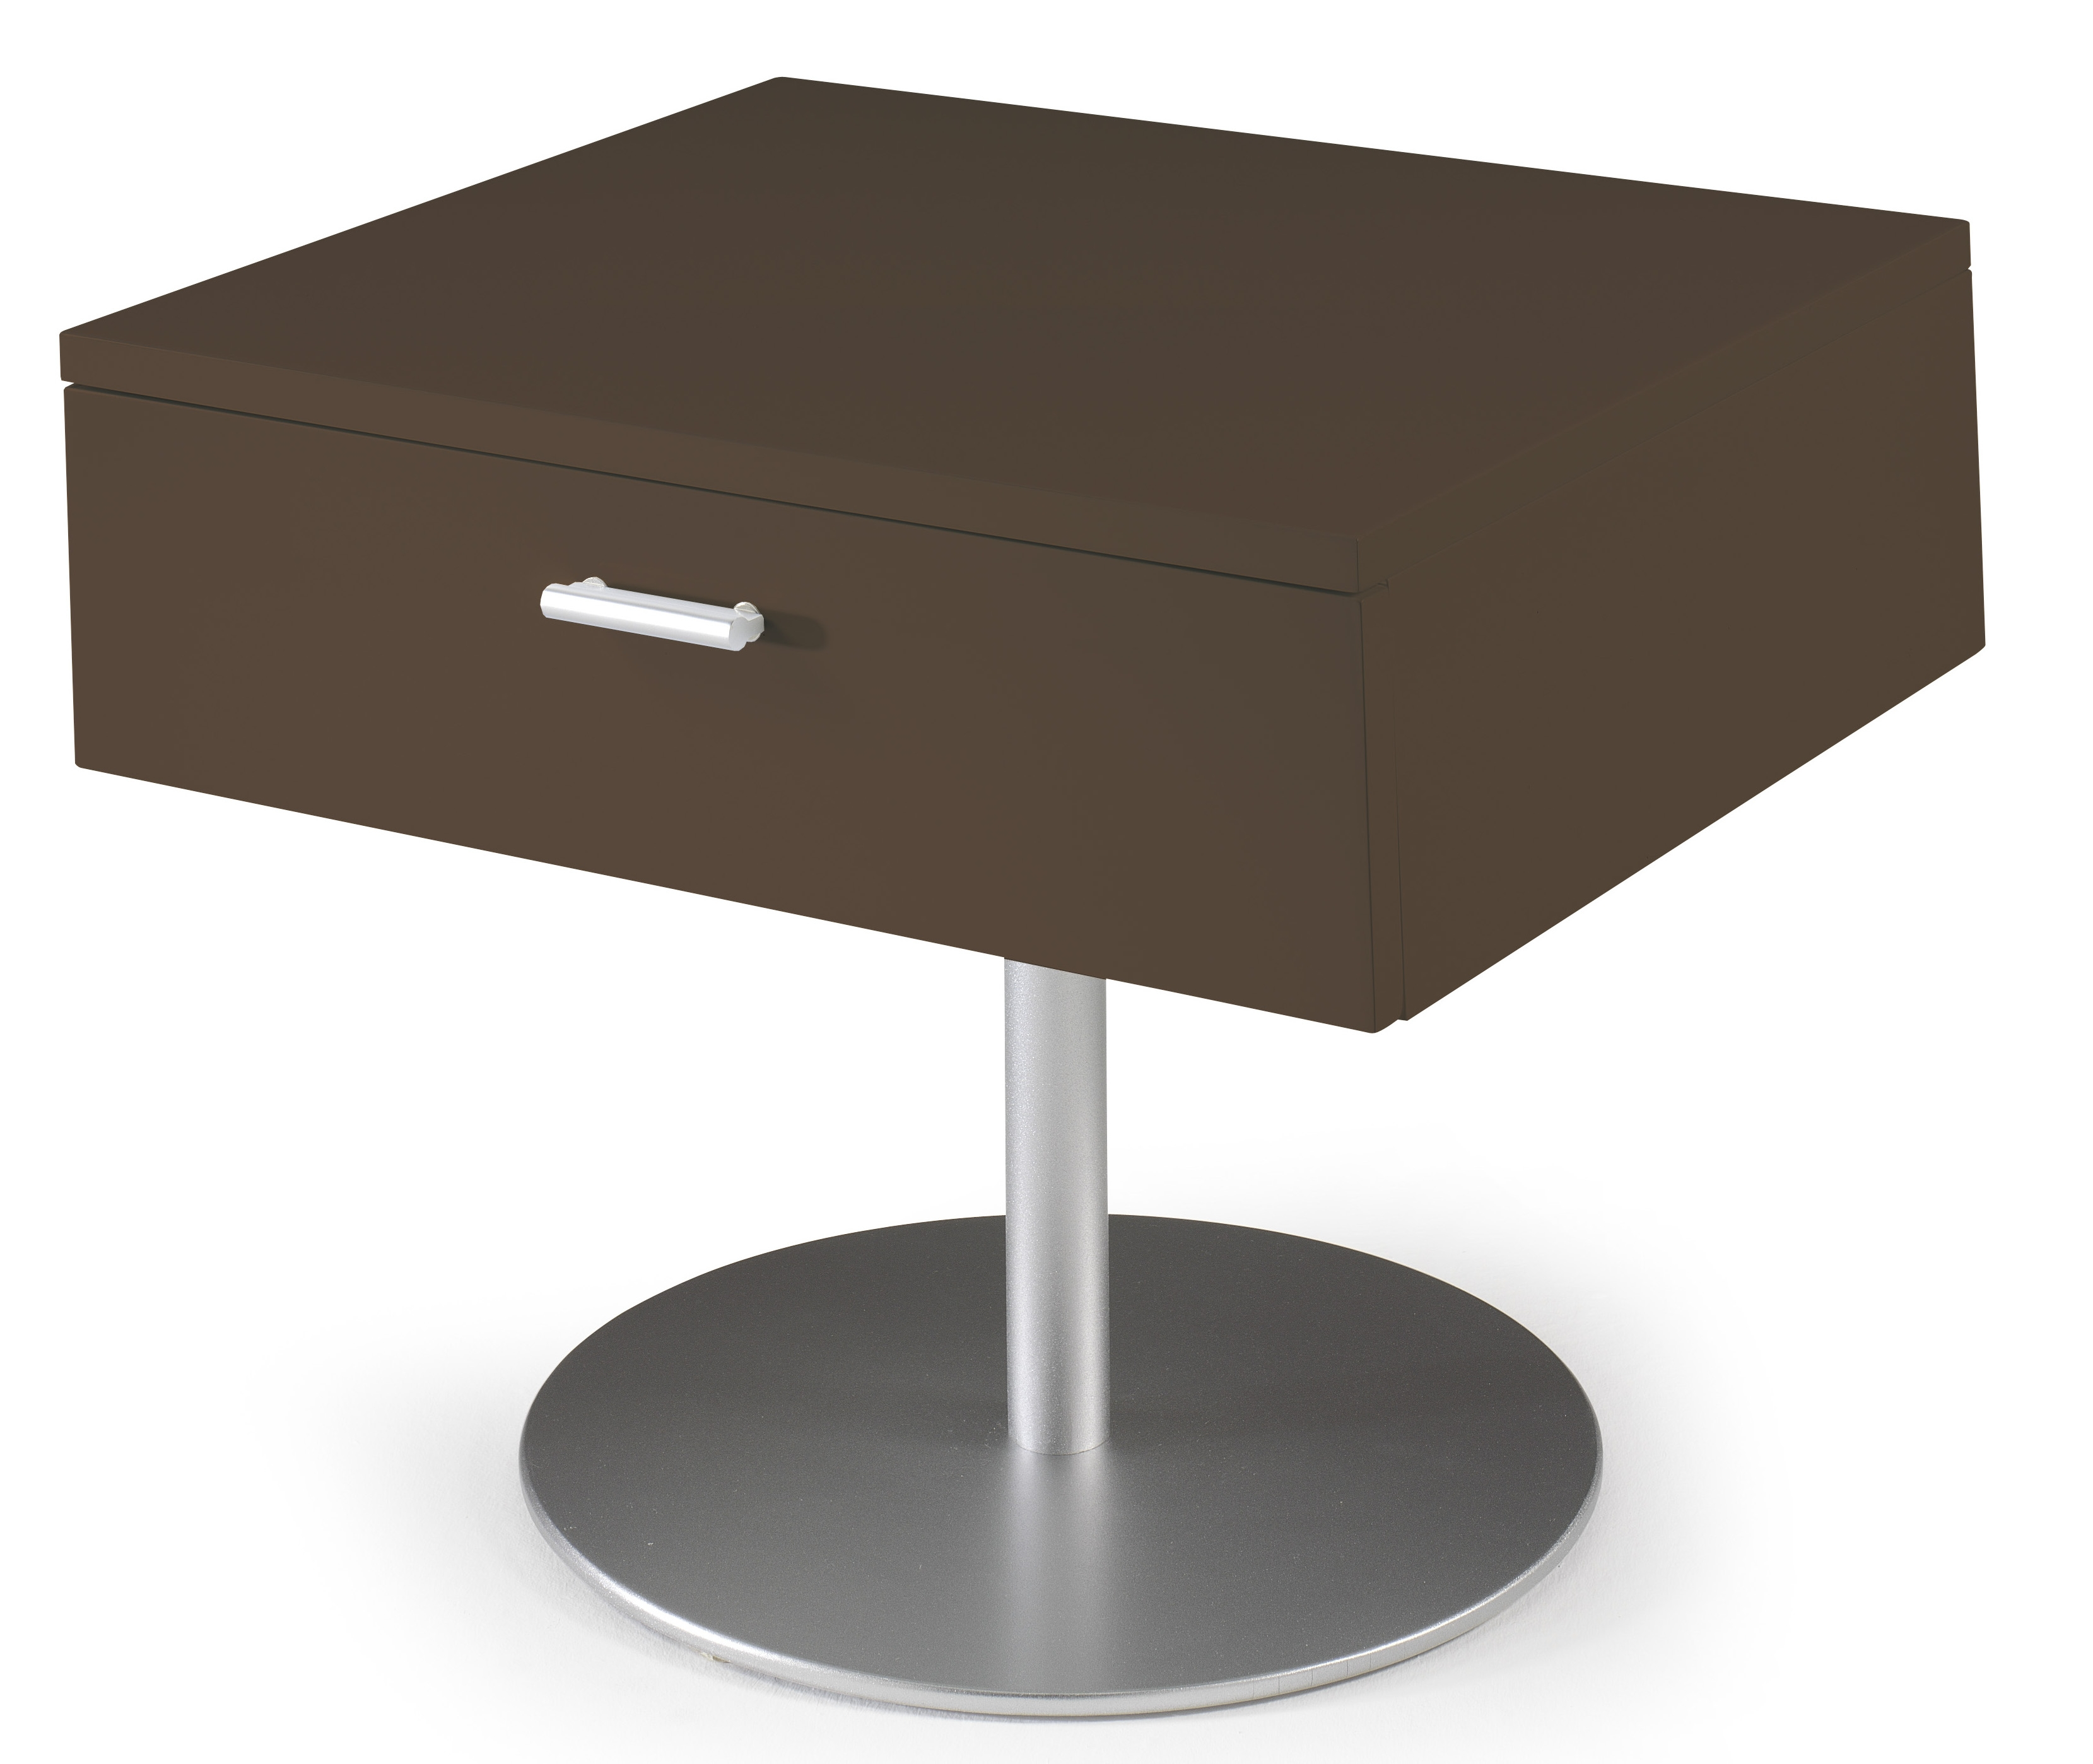 table de chevet design marron laqu kara. Black Bedroom Furniture Sets. Home Design Ideas